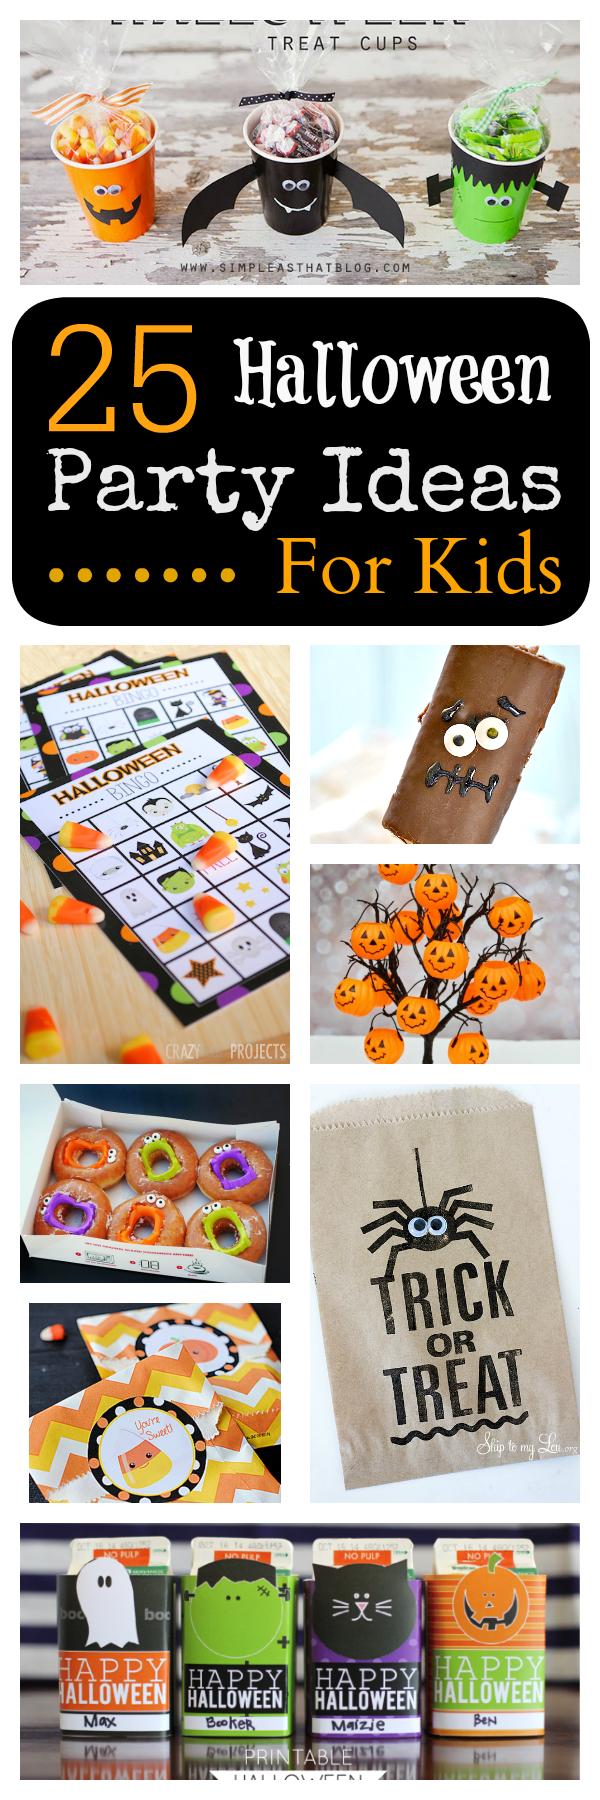 25 School Halloween Party Ideas for Kids | For kids, Halloween ...